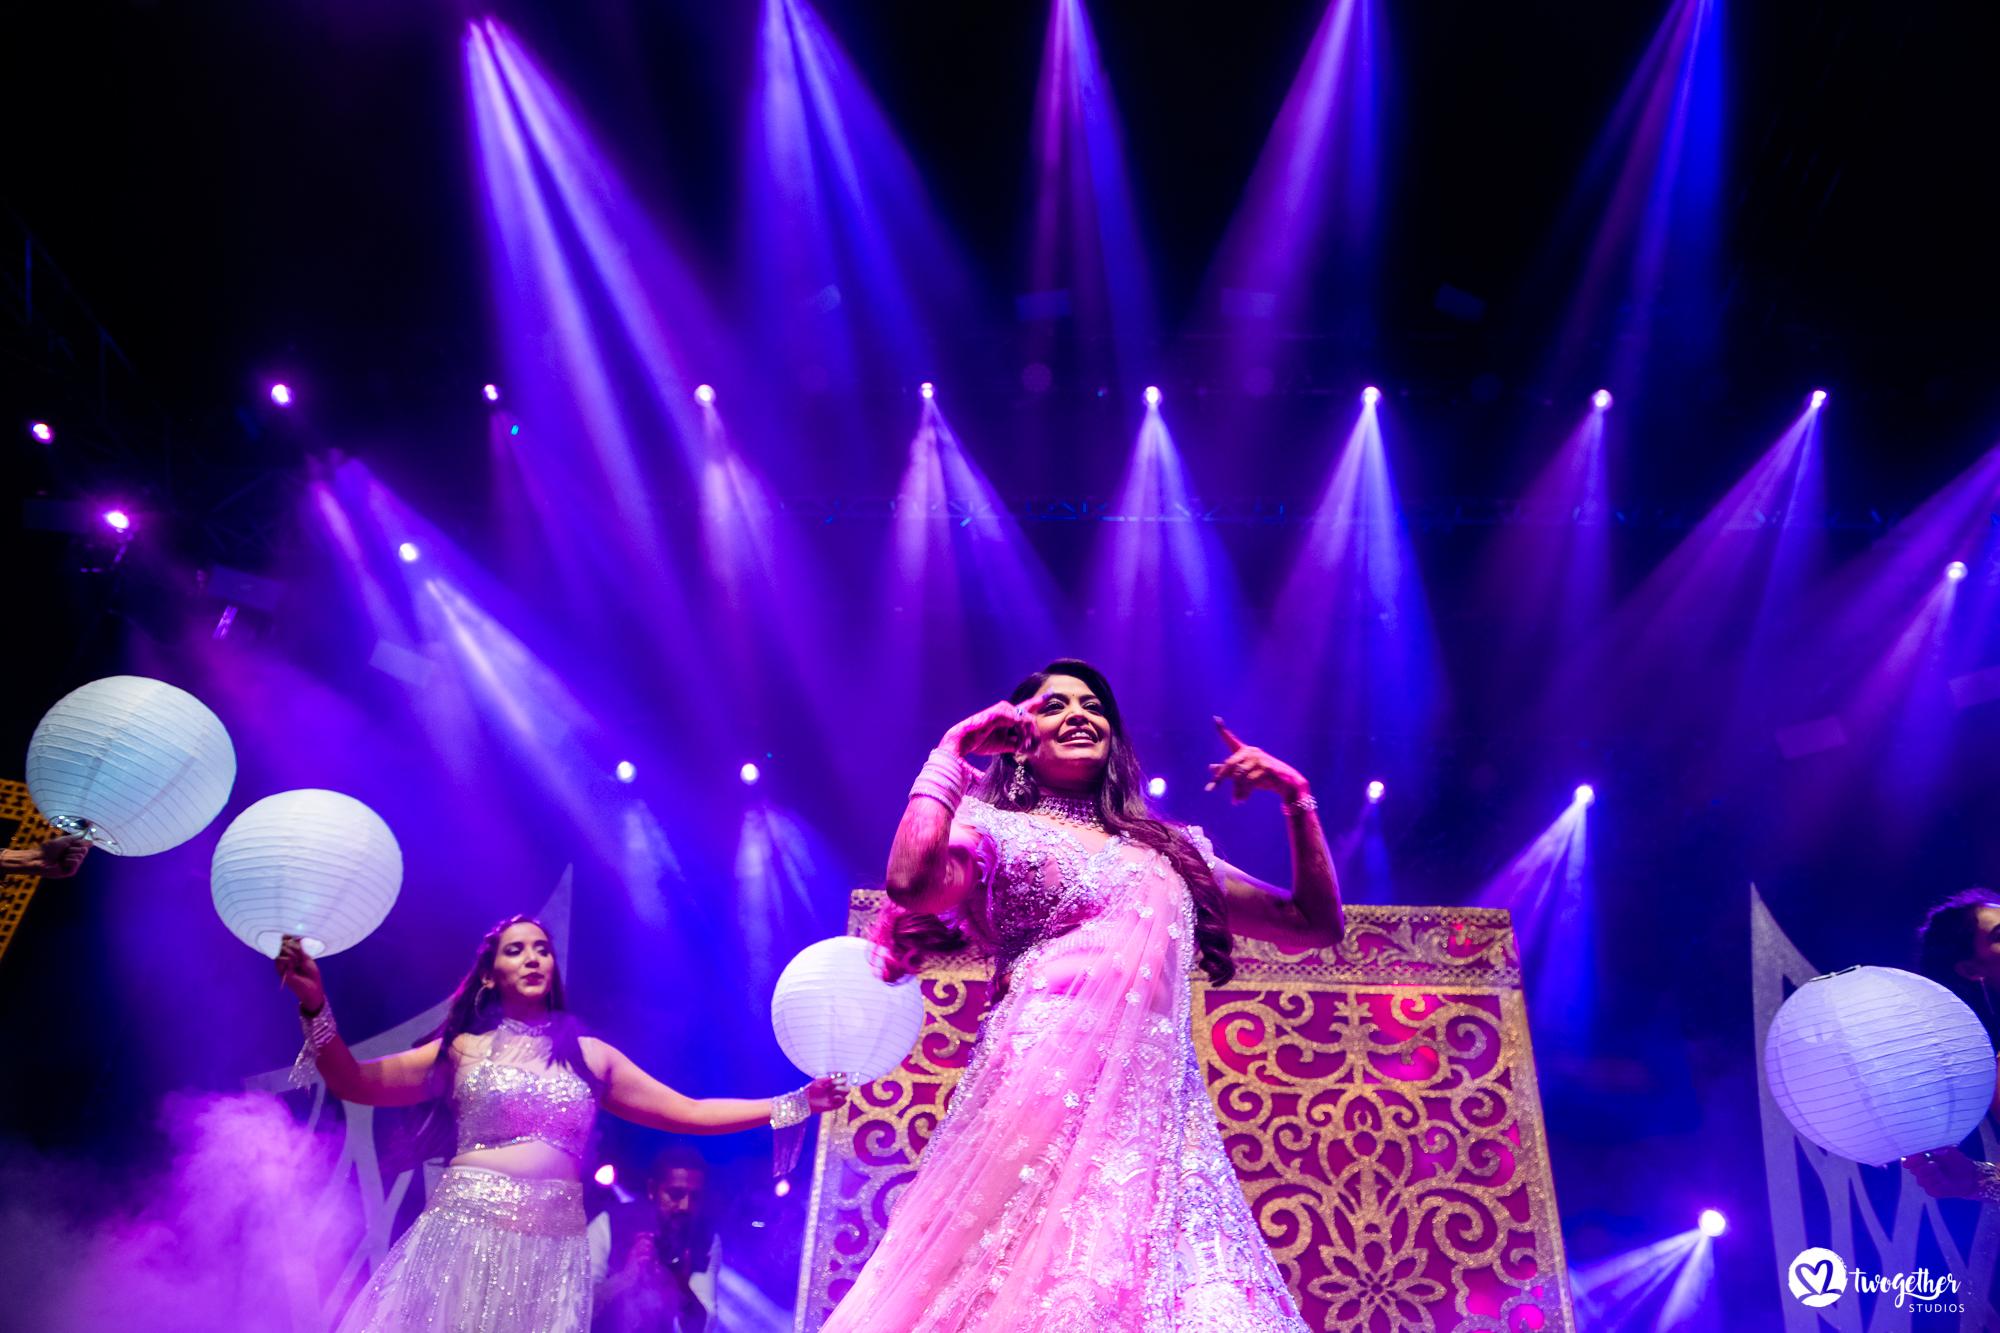 Sangeet bridal dance performance at Udaipur destination wedding in Udaivilas.